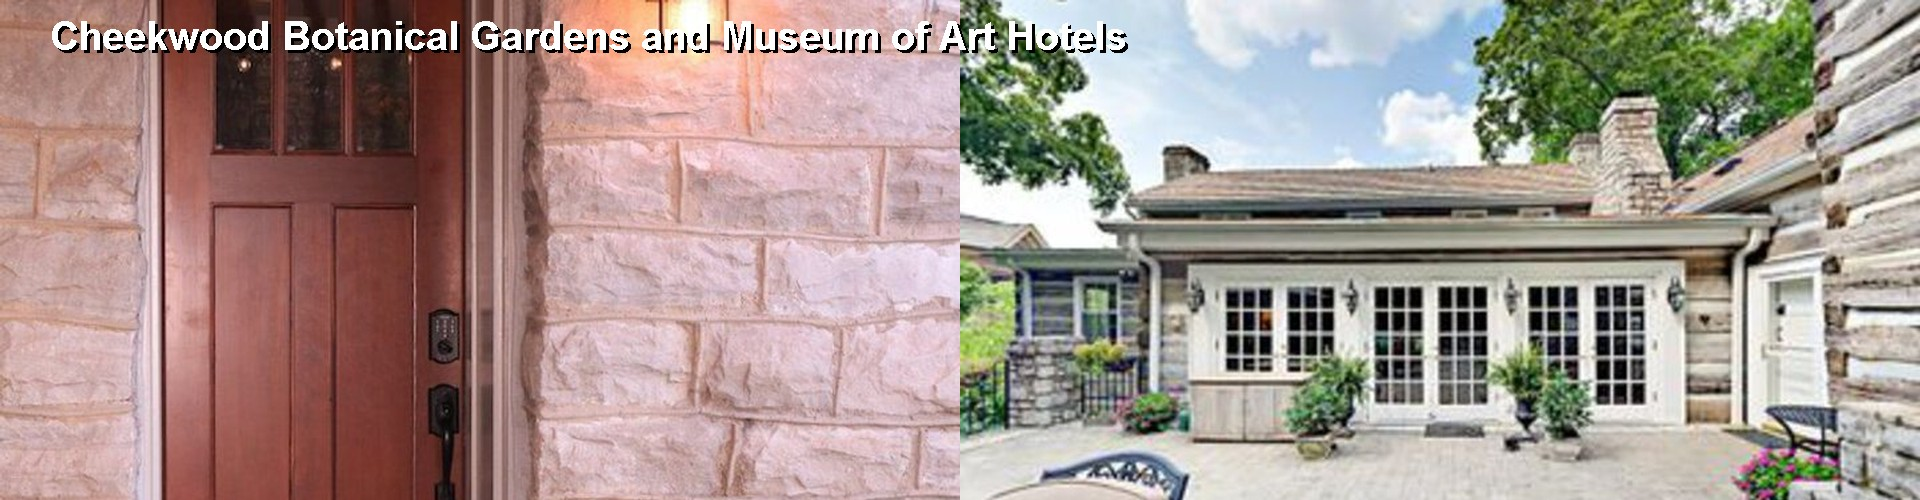 5 Best Hotels Near Cheekwood Botanical Gardens And Museum Of Art